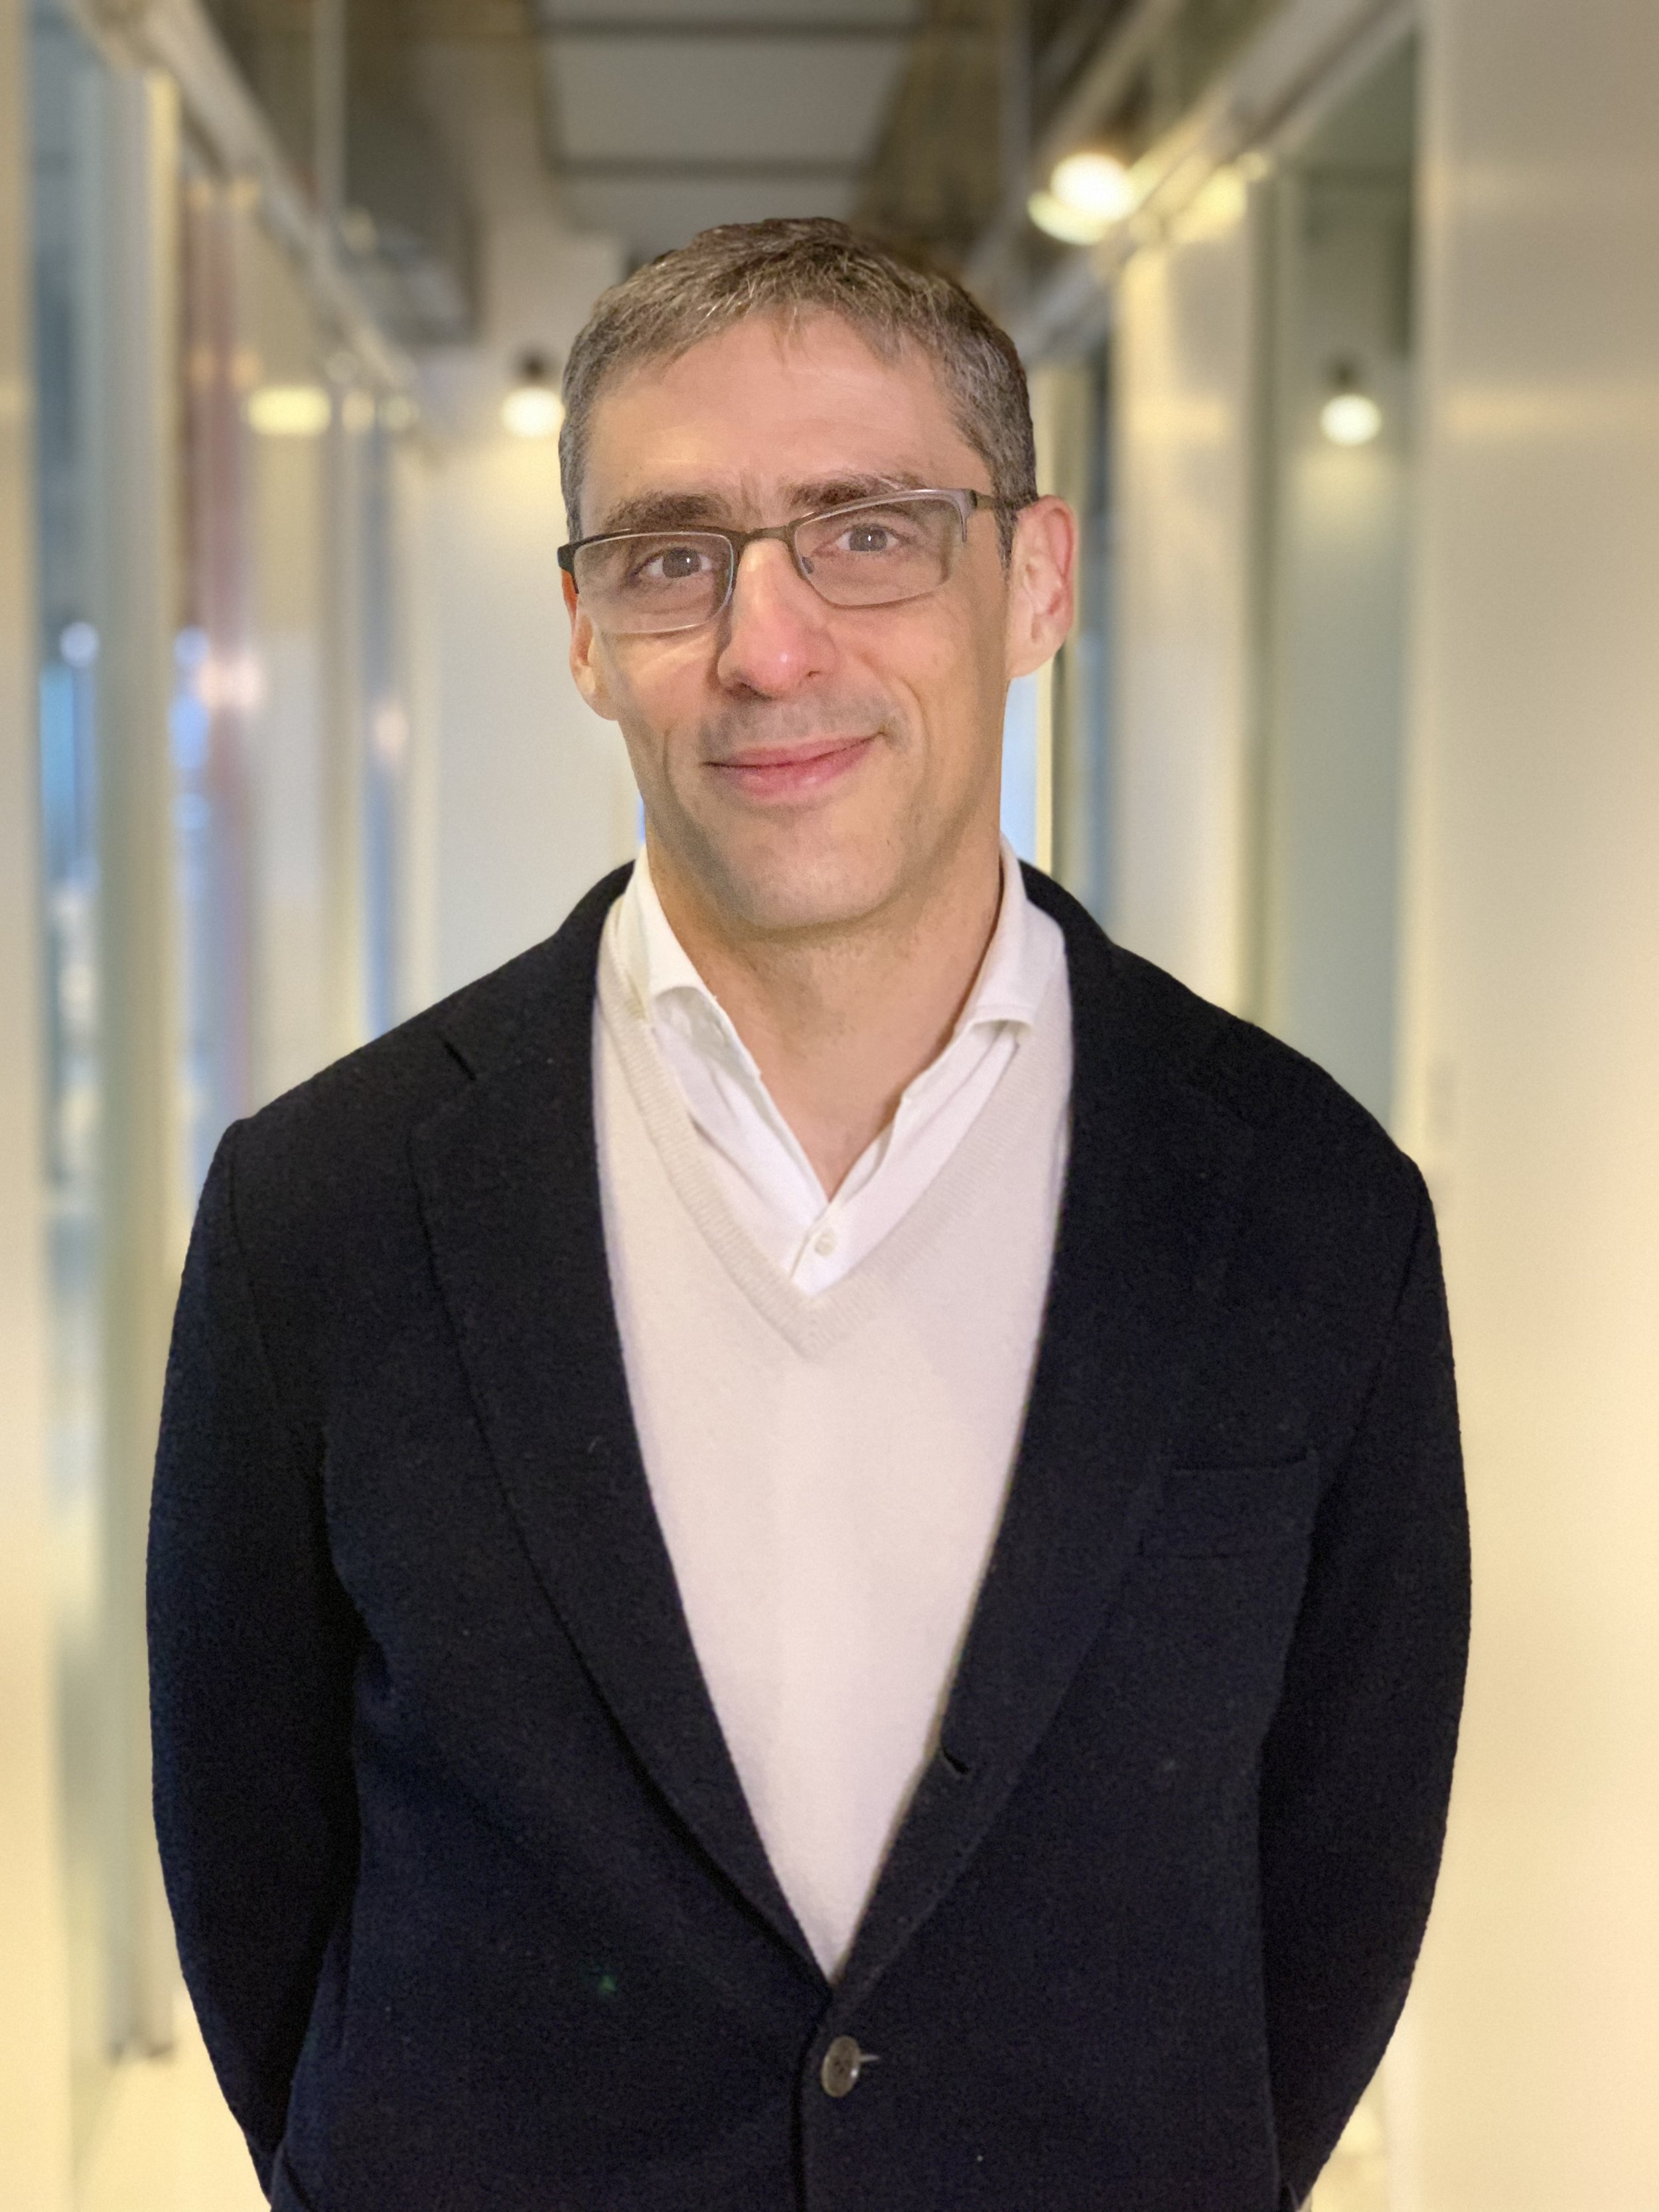 Raoul GSlavin Juliá - Director